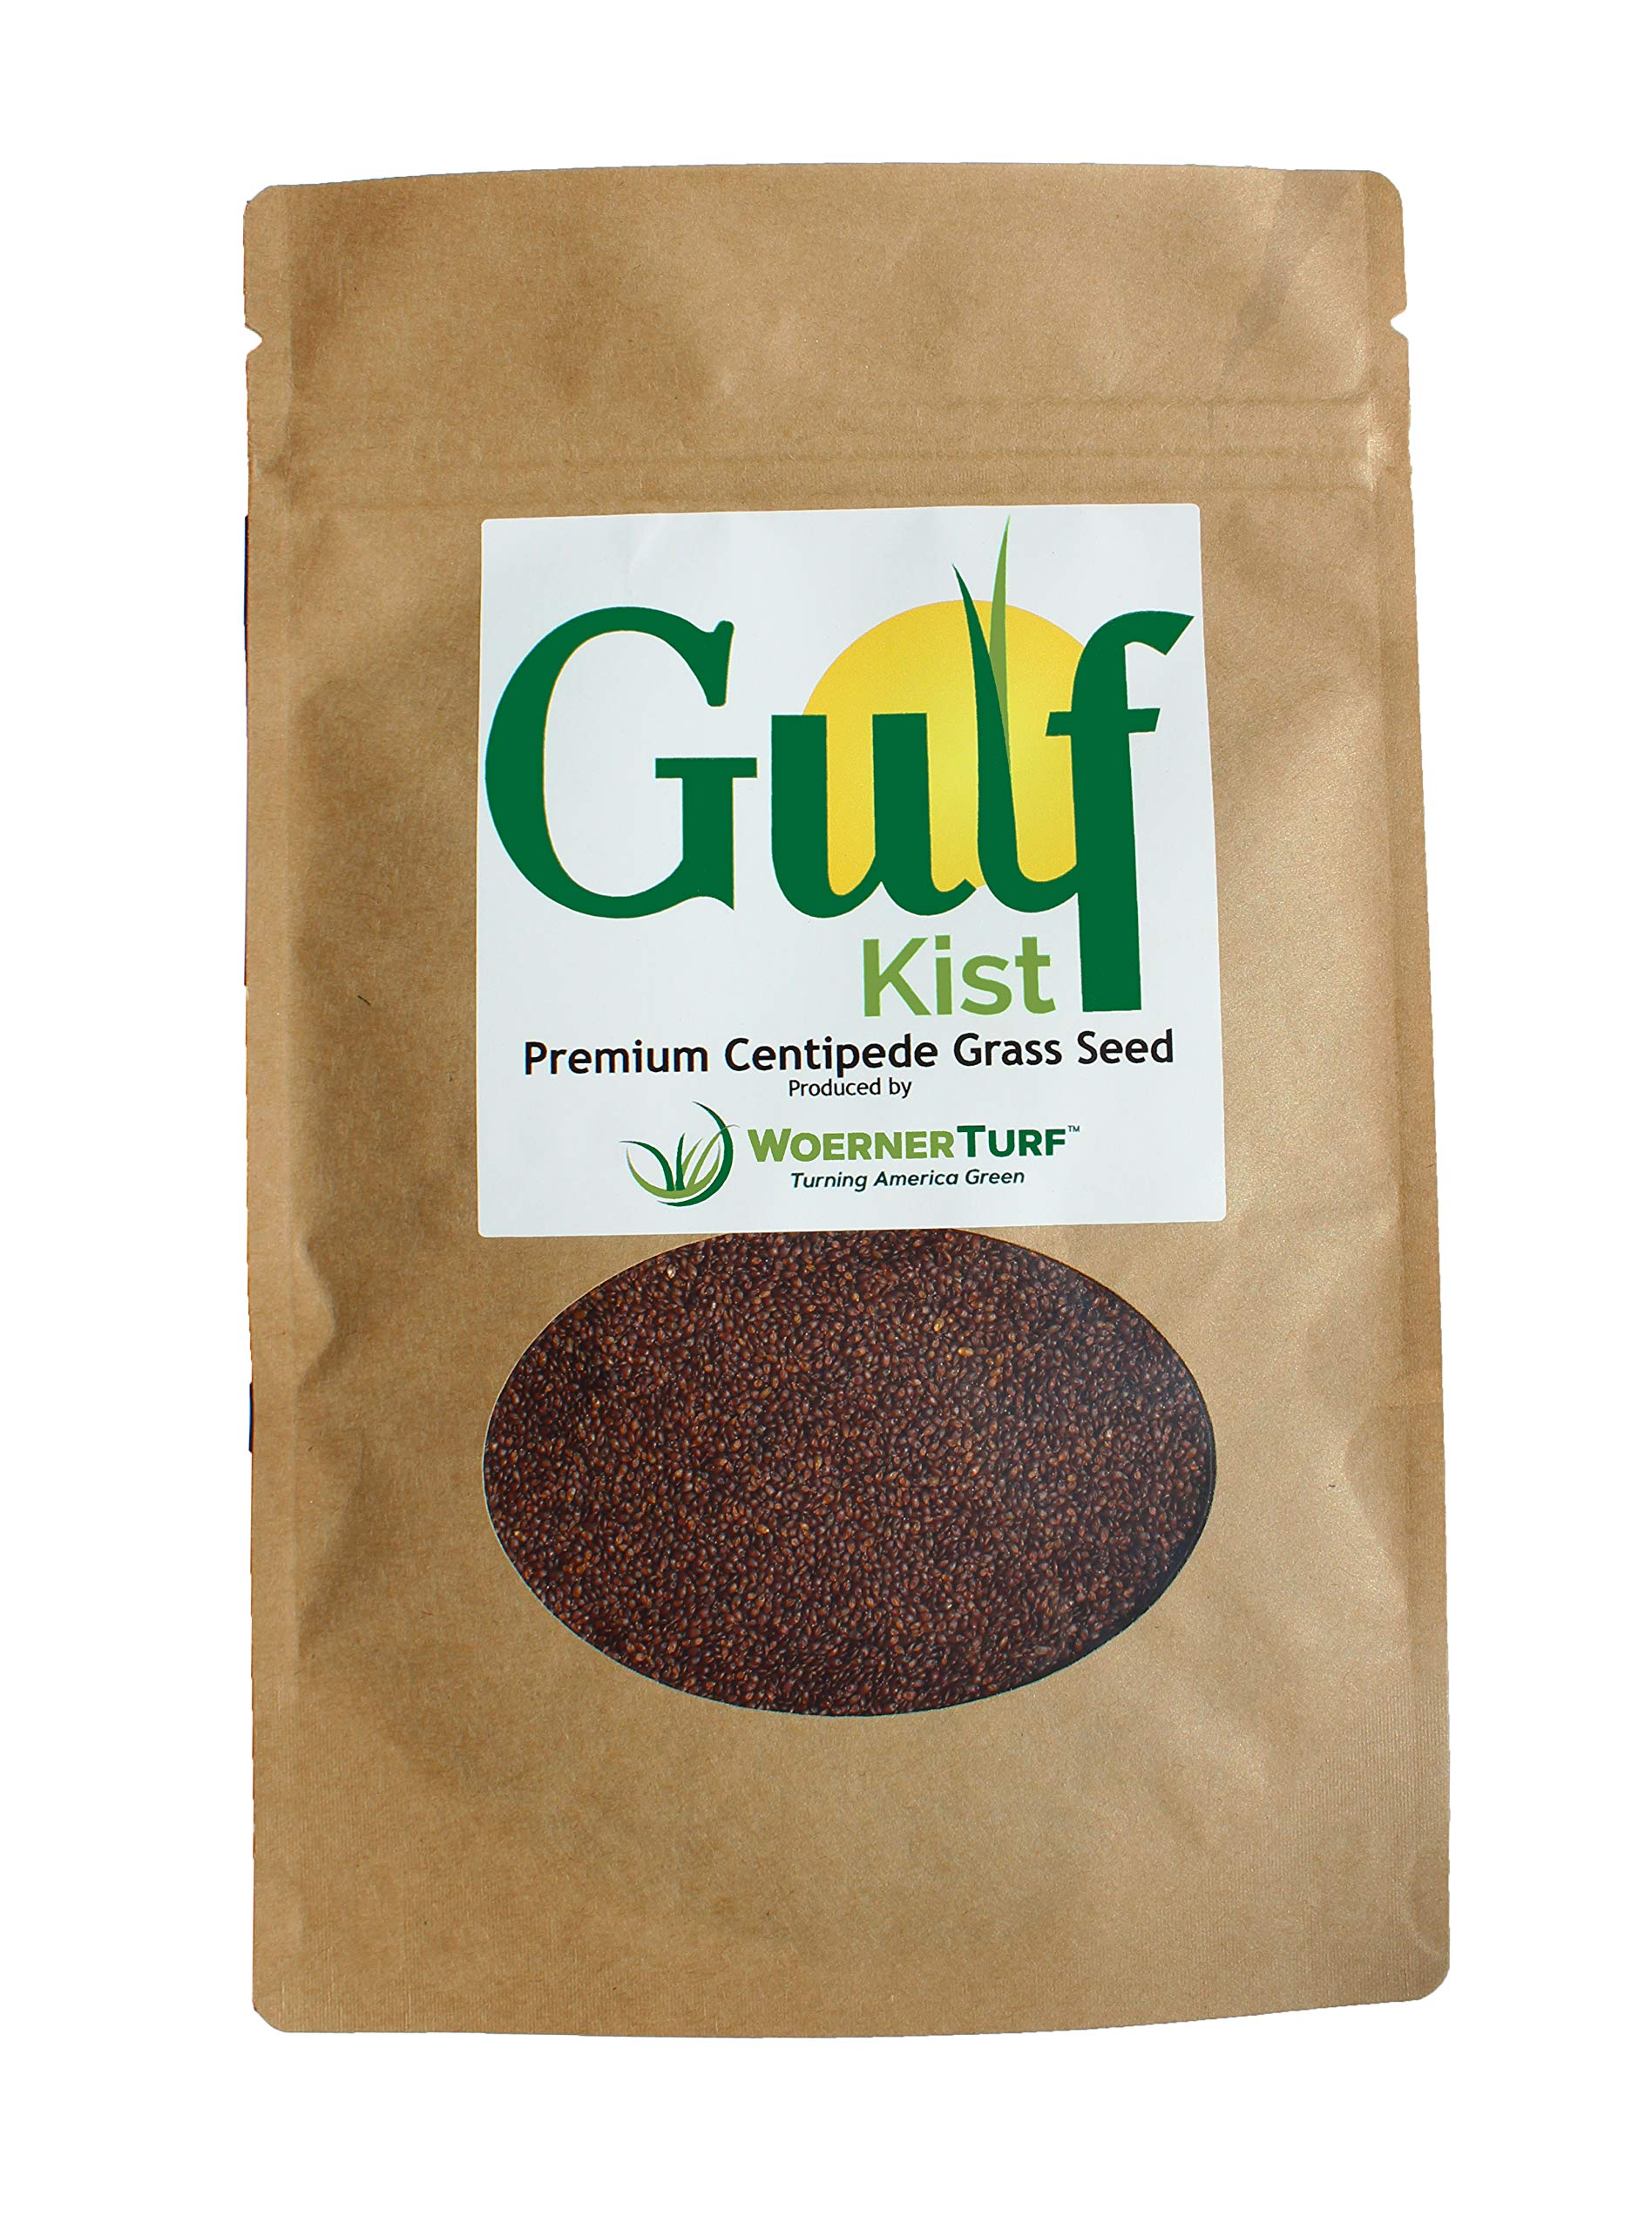 Gulf Kist Centipede Grass Seed Raw (1lb)